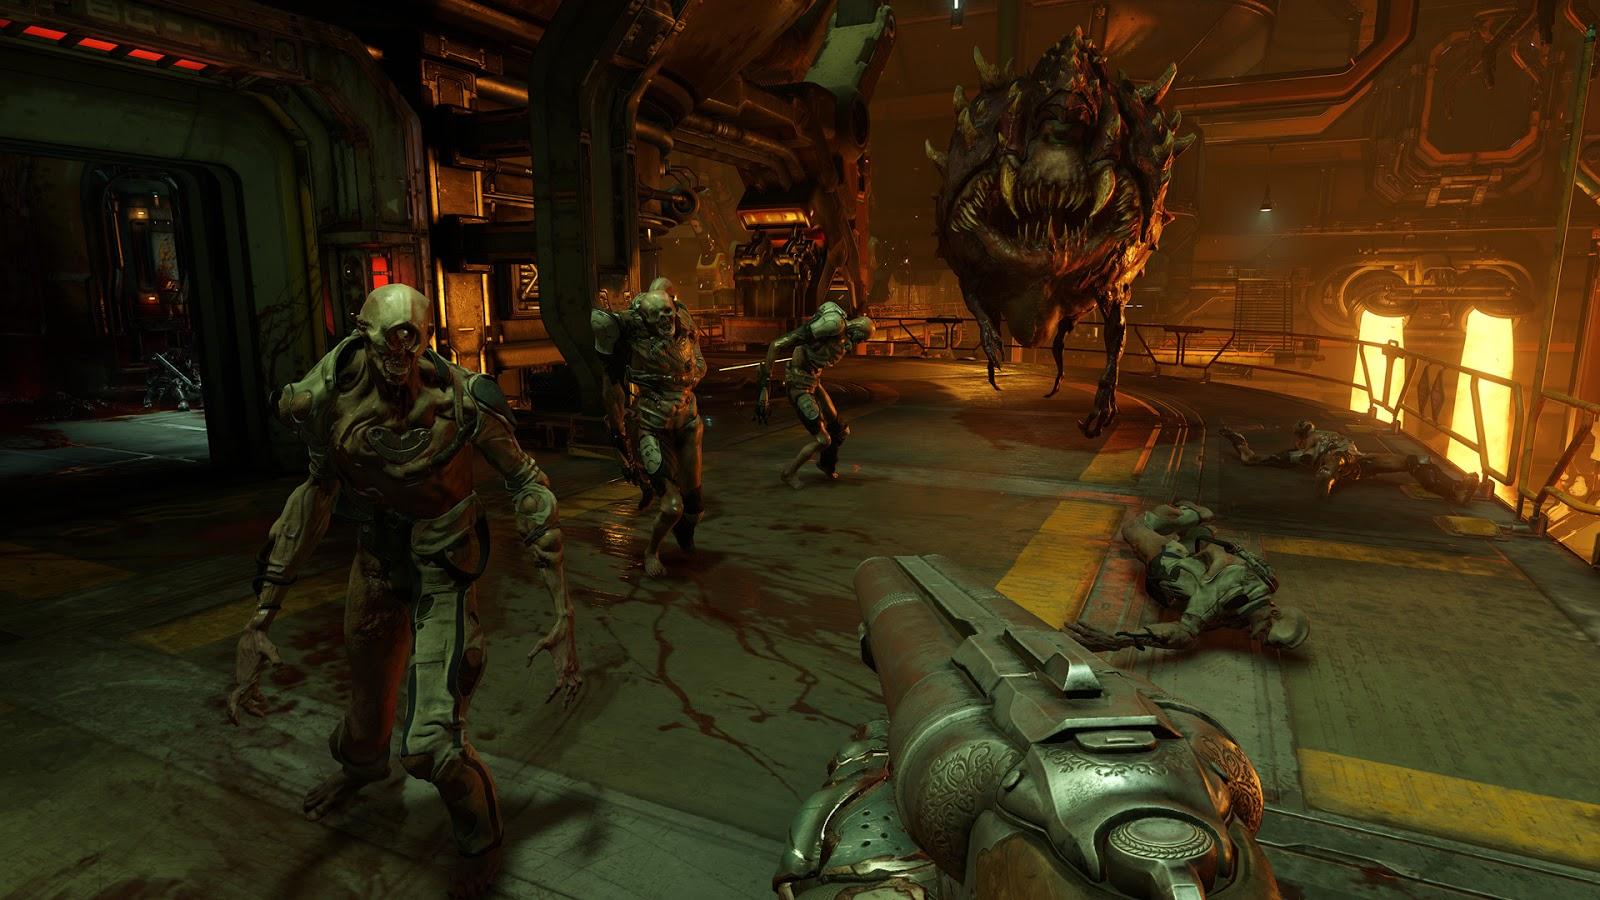 ESR - Quake Champions - Dead on Arrival? - Quake Champions Forum